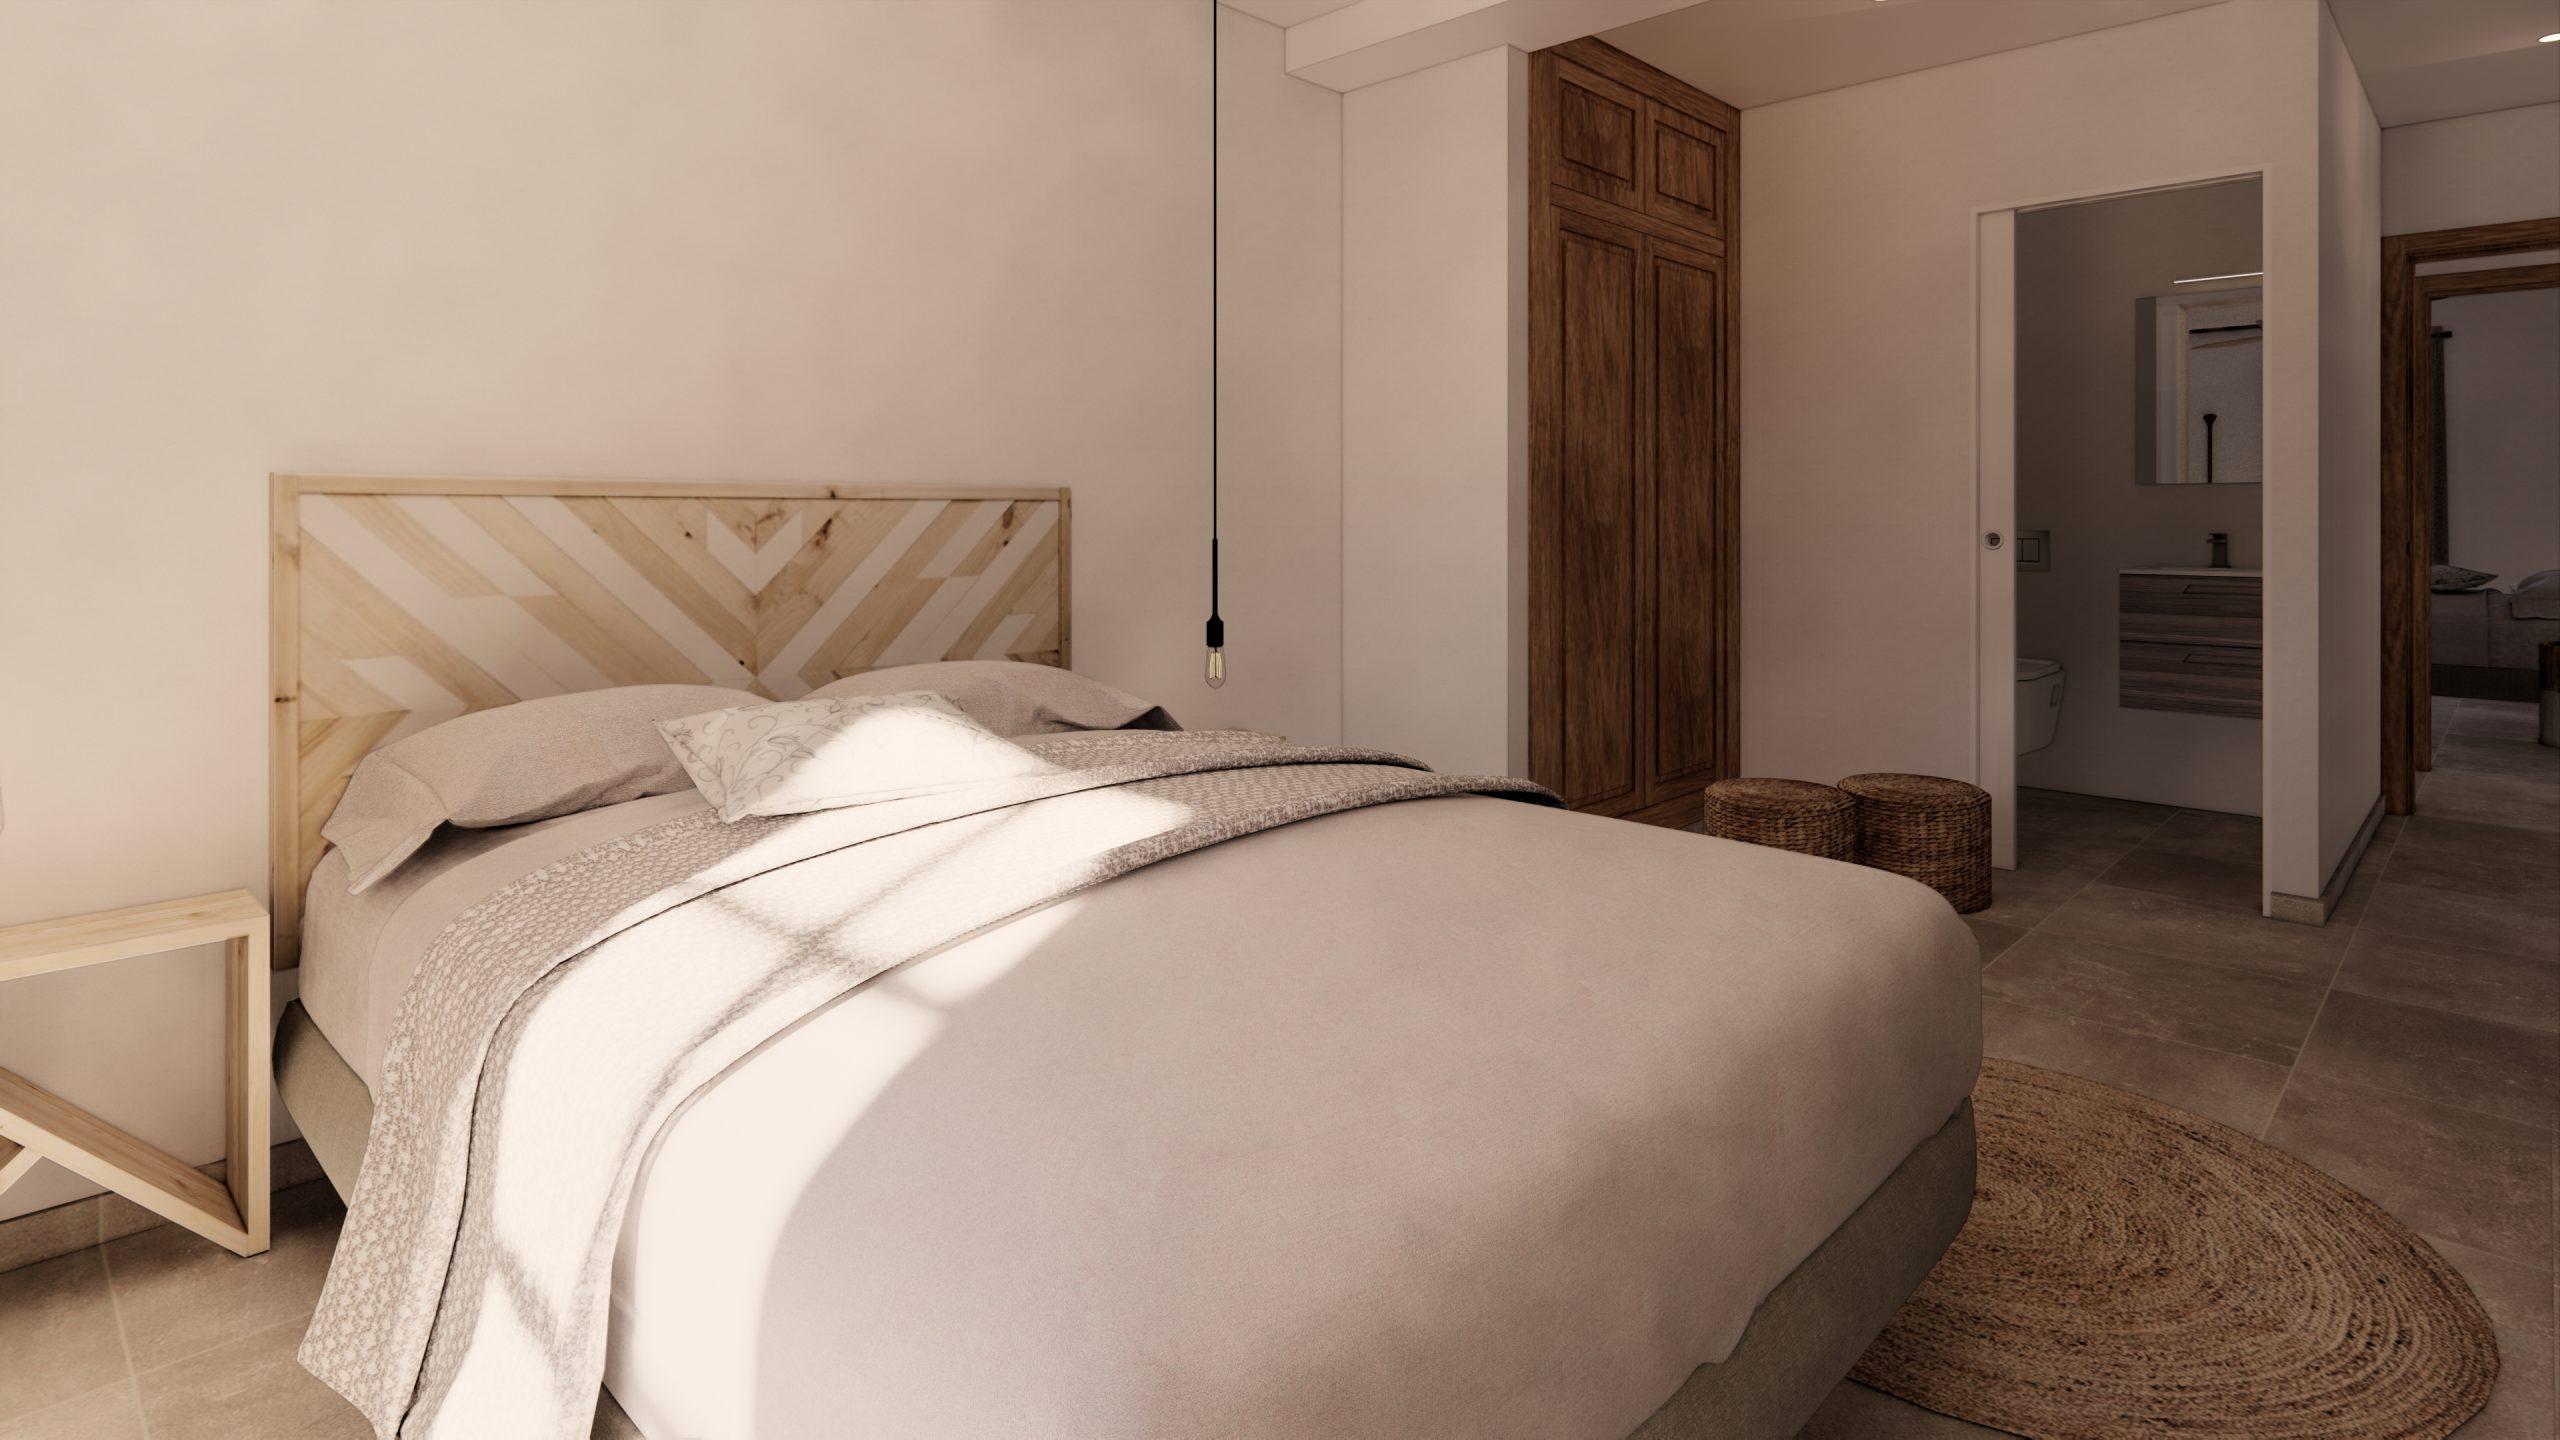 dormitorio1 (2)